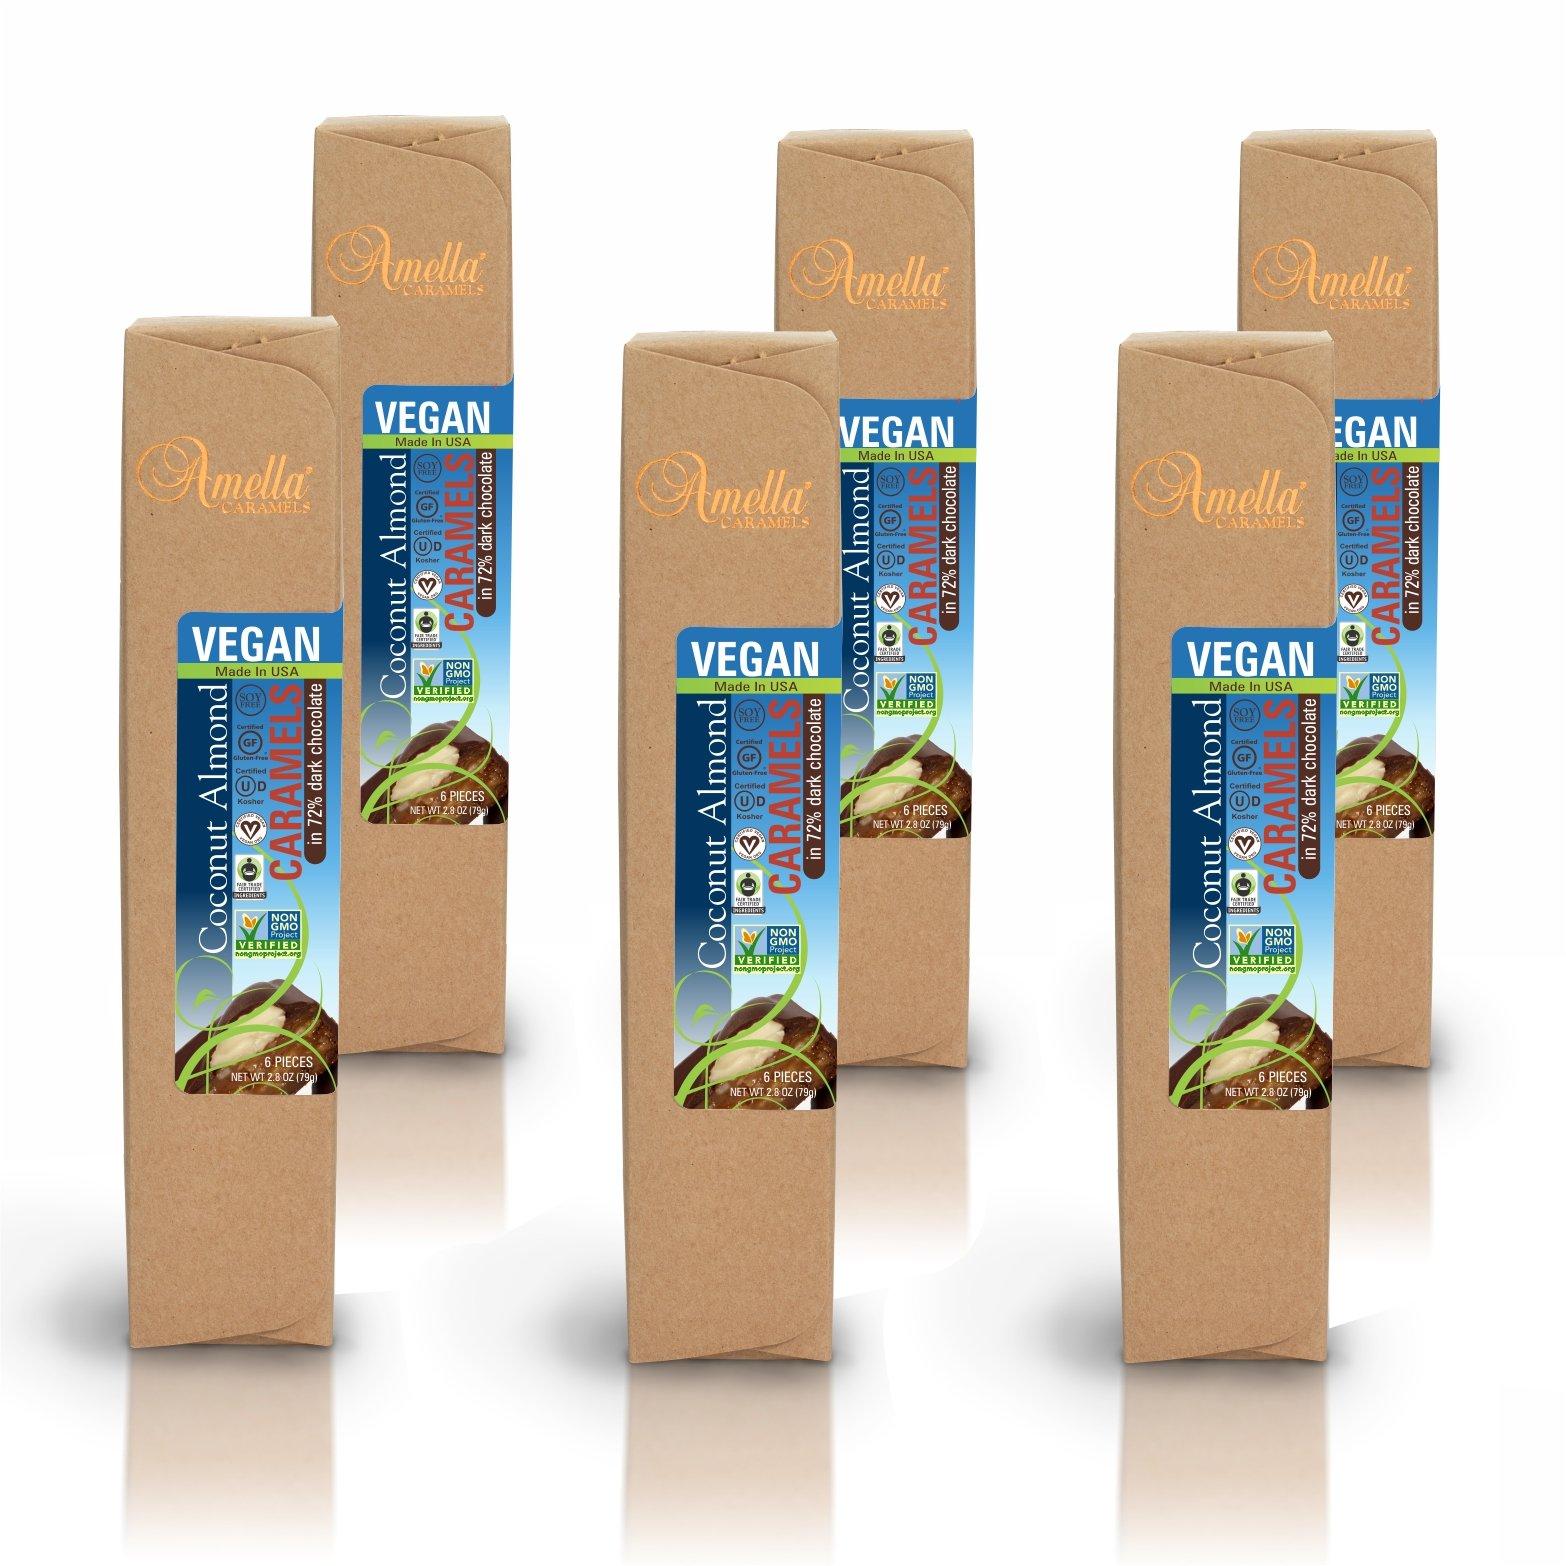 Organic Vegan Coconut Almond Caramels in 72% Dark Chocolate, 16.8 ounces (6 packs - 6 pcs/pack)